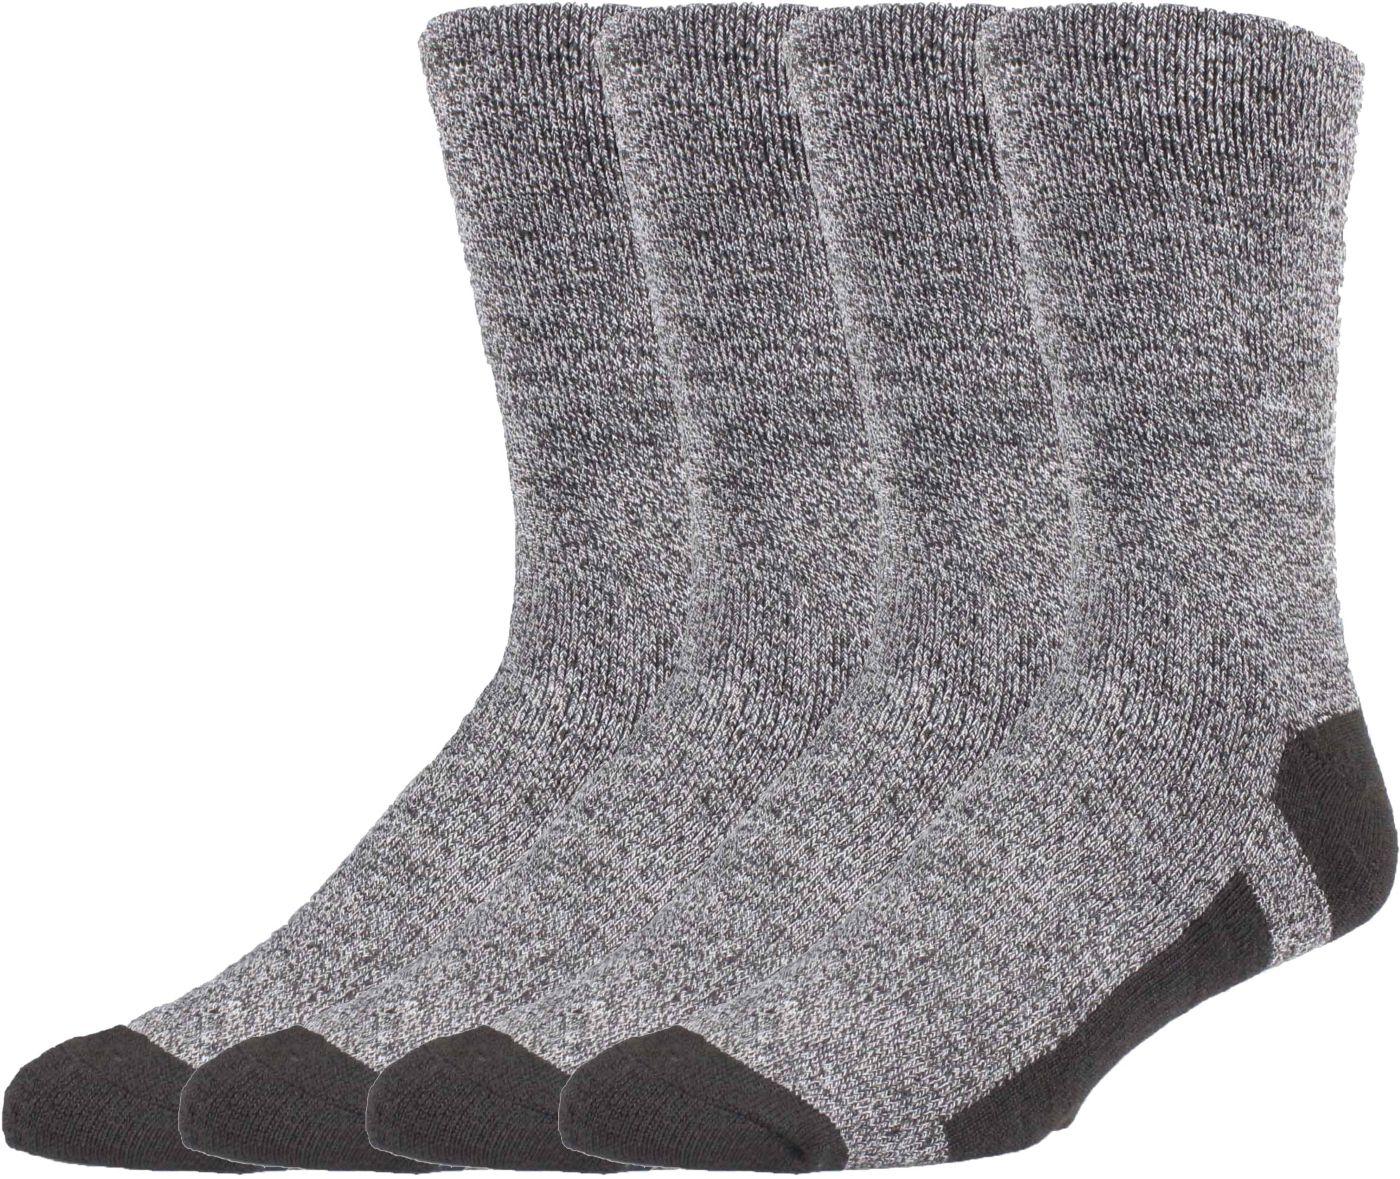 Field & Stream Long Trail Hiking Socks - 4-Pack